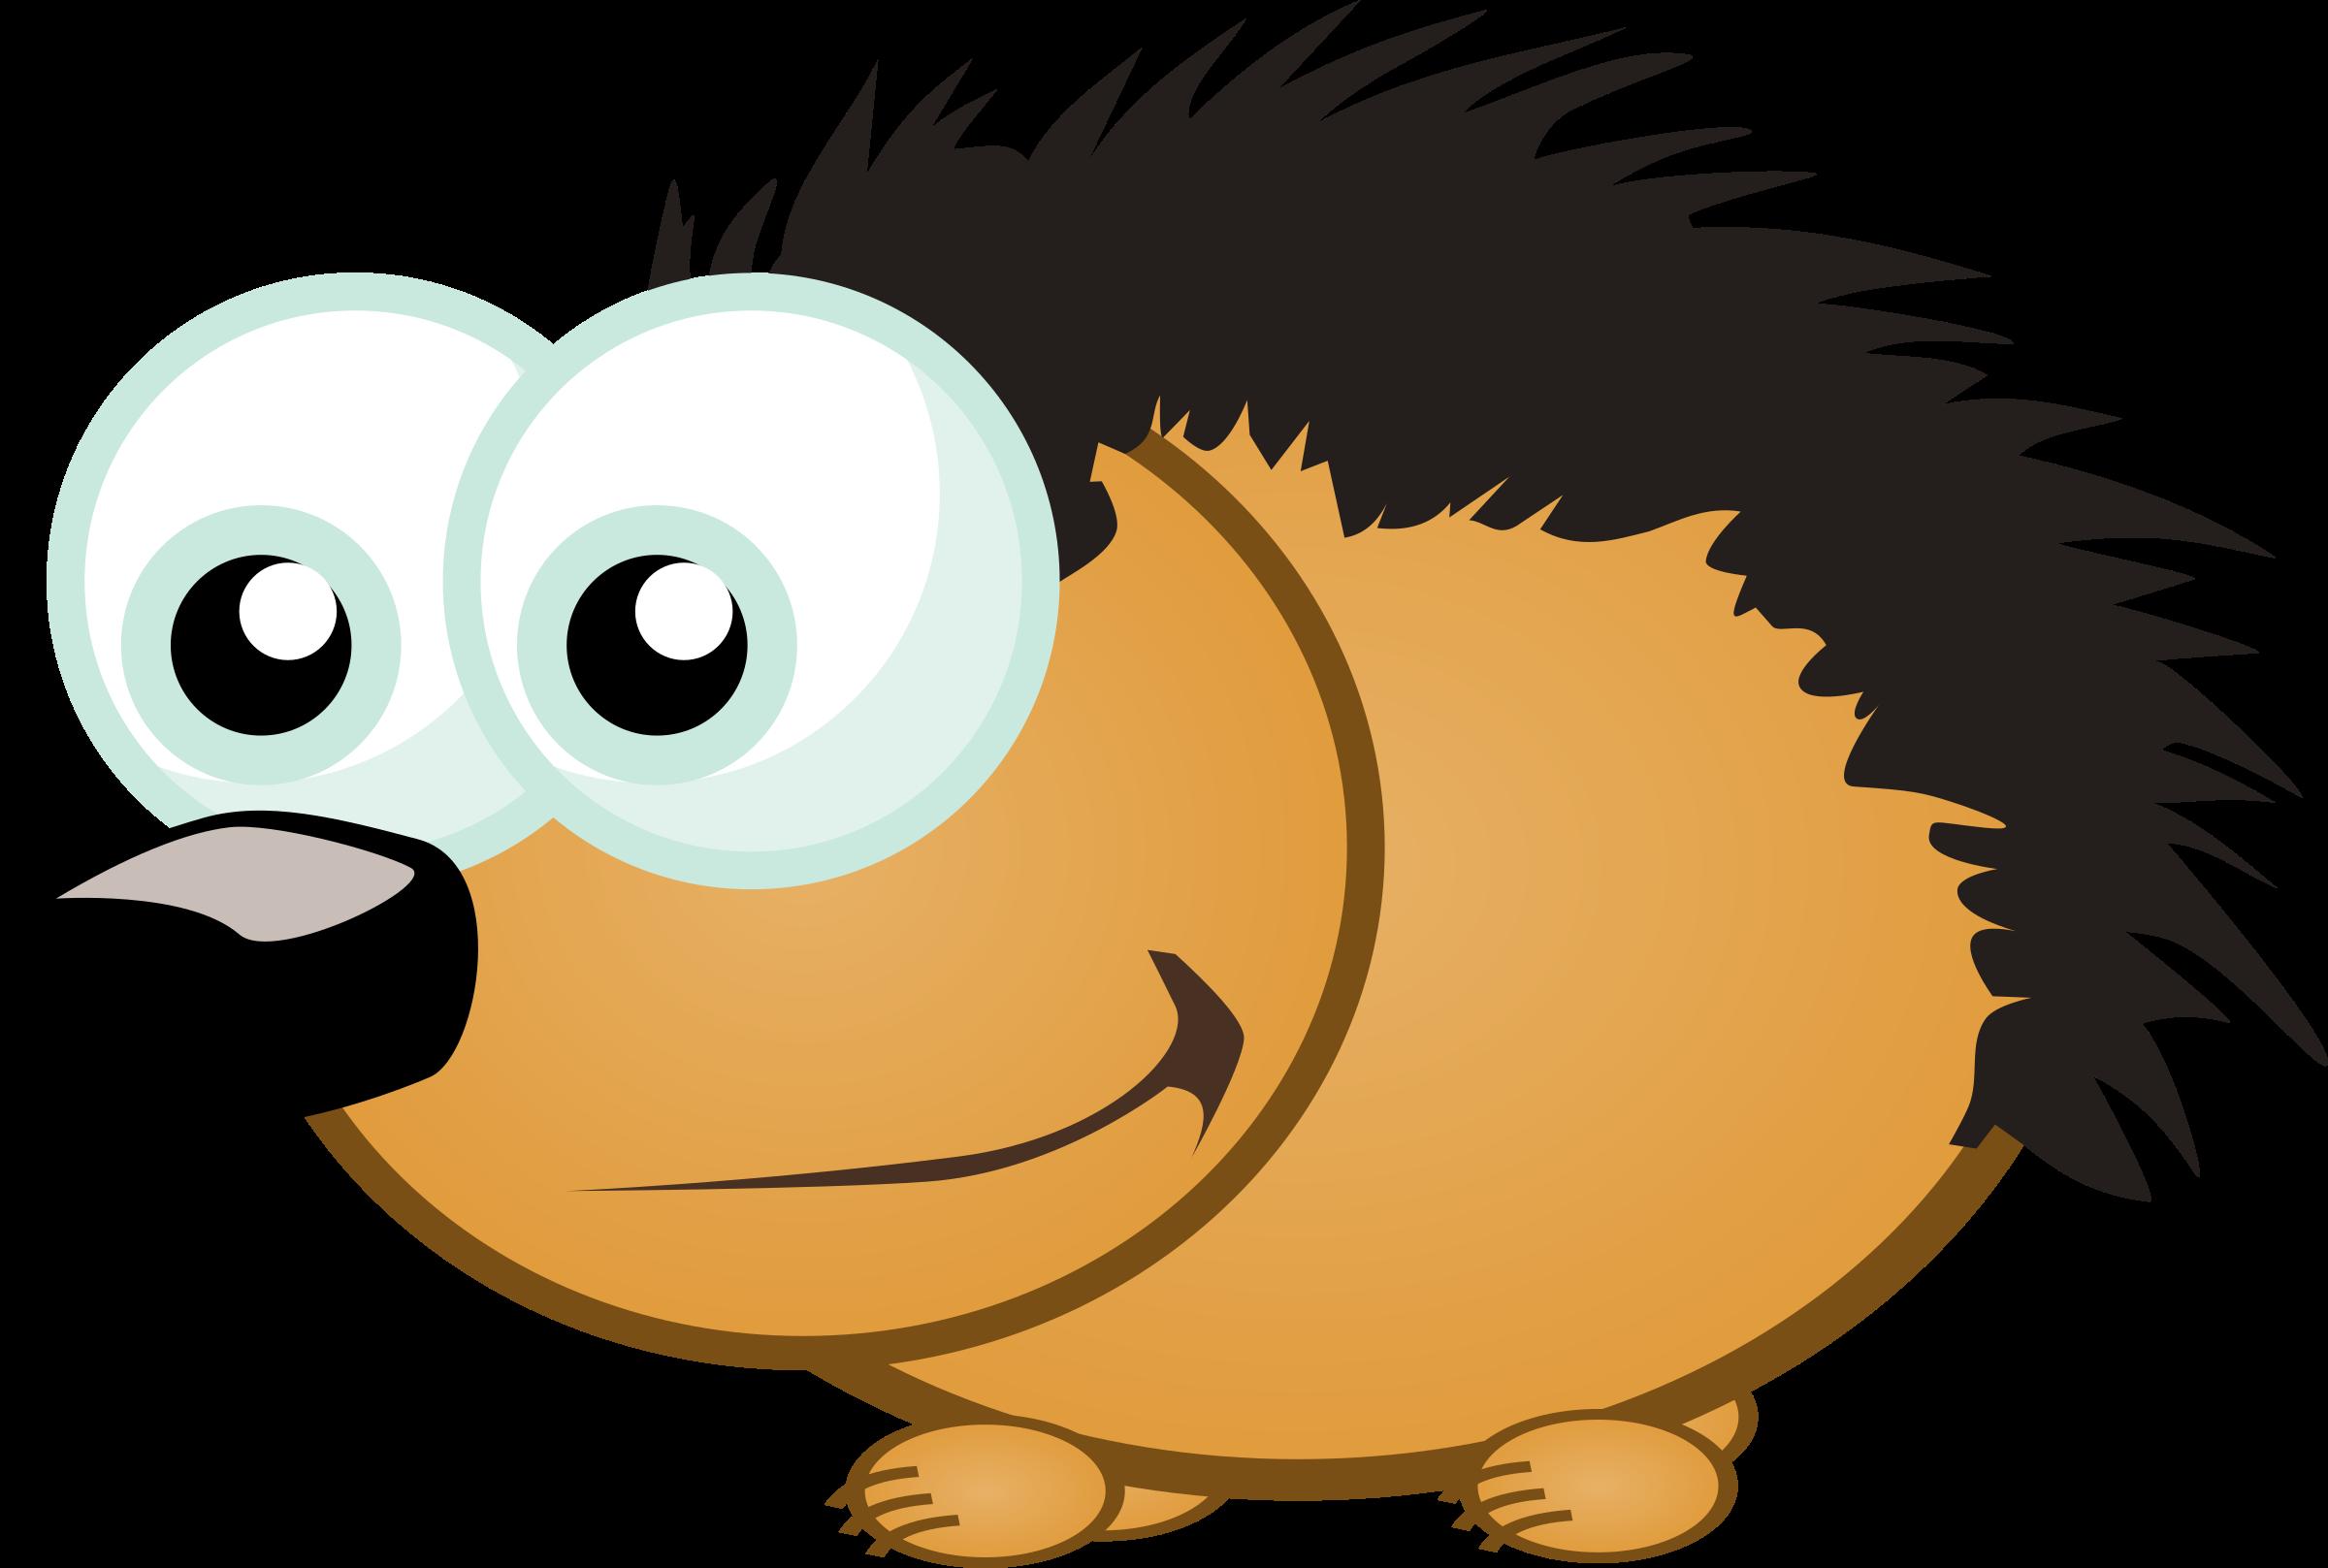 Hedgehog clipart hiran Hedgehog Hedgehog Clipart Small Small